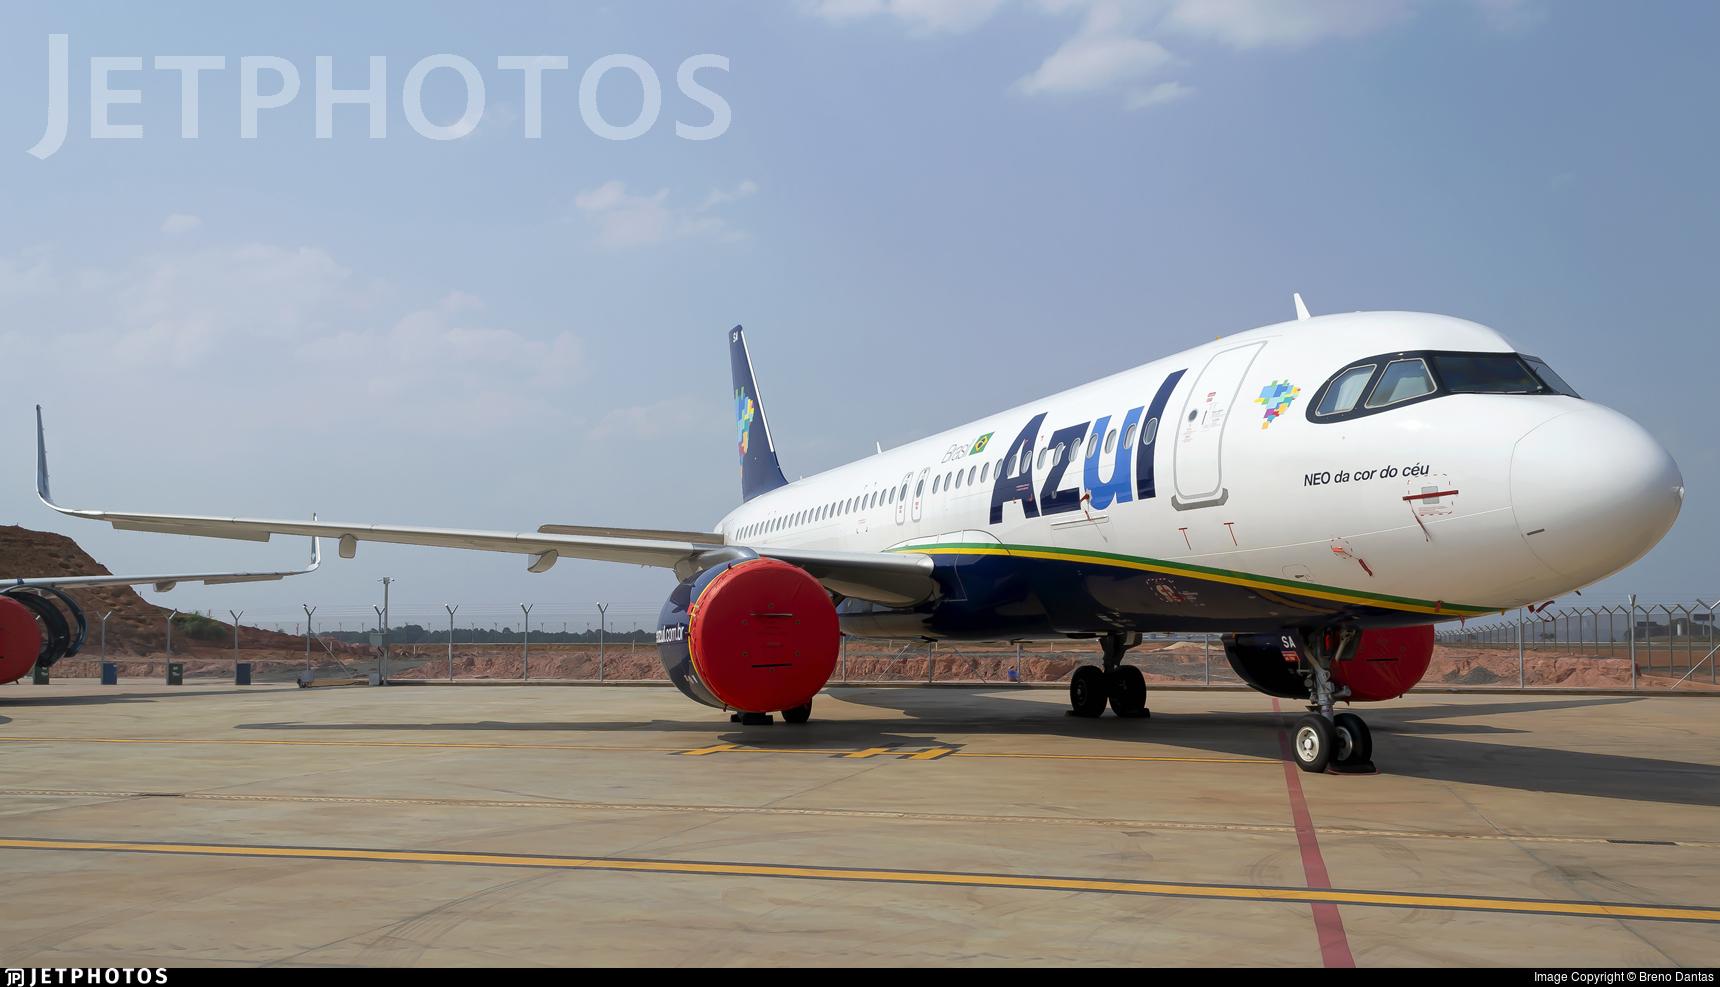 PR-YSA - Airbus A320-251N - Azul Linhas Aéreas Brasileiras